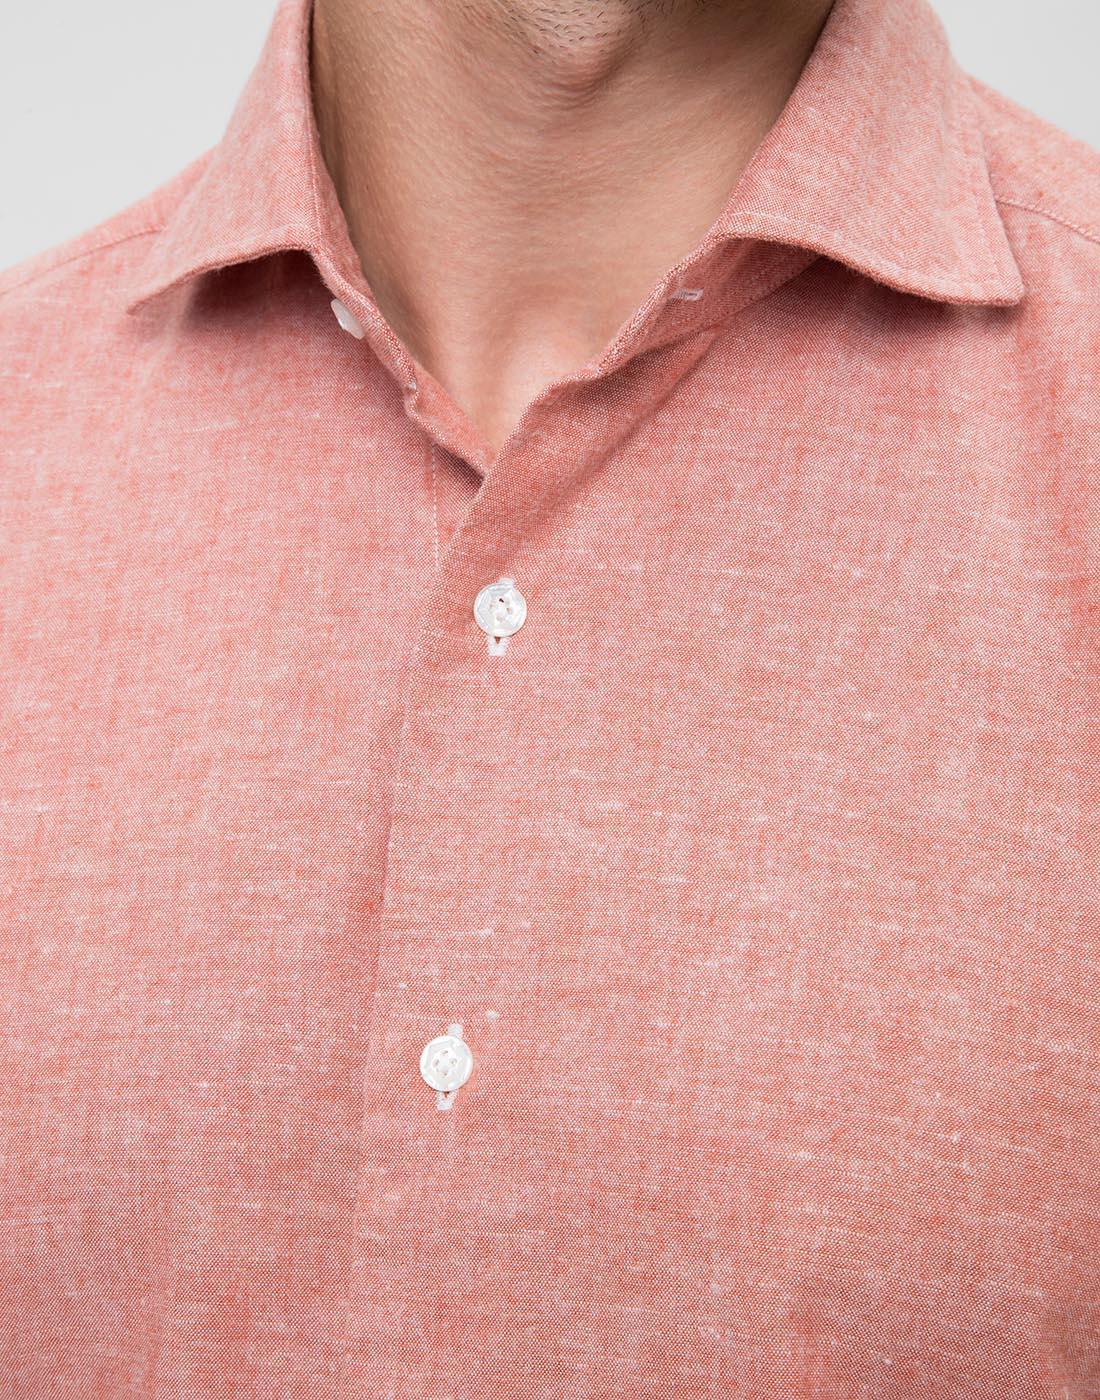 Мужская оранжевая рубашка Barba S556603U-7